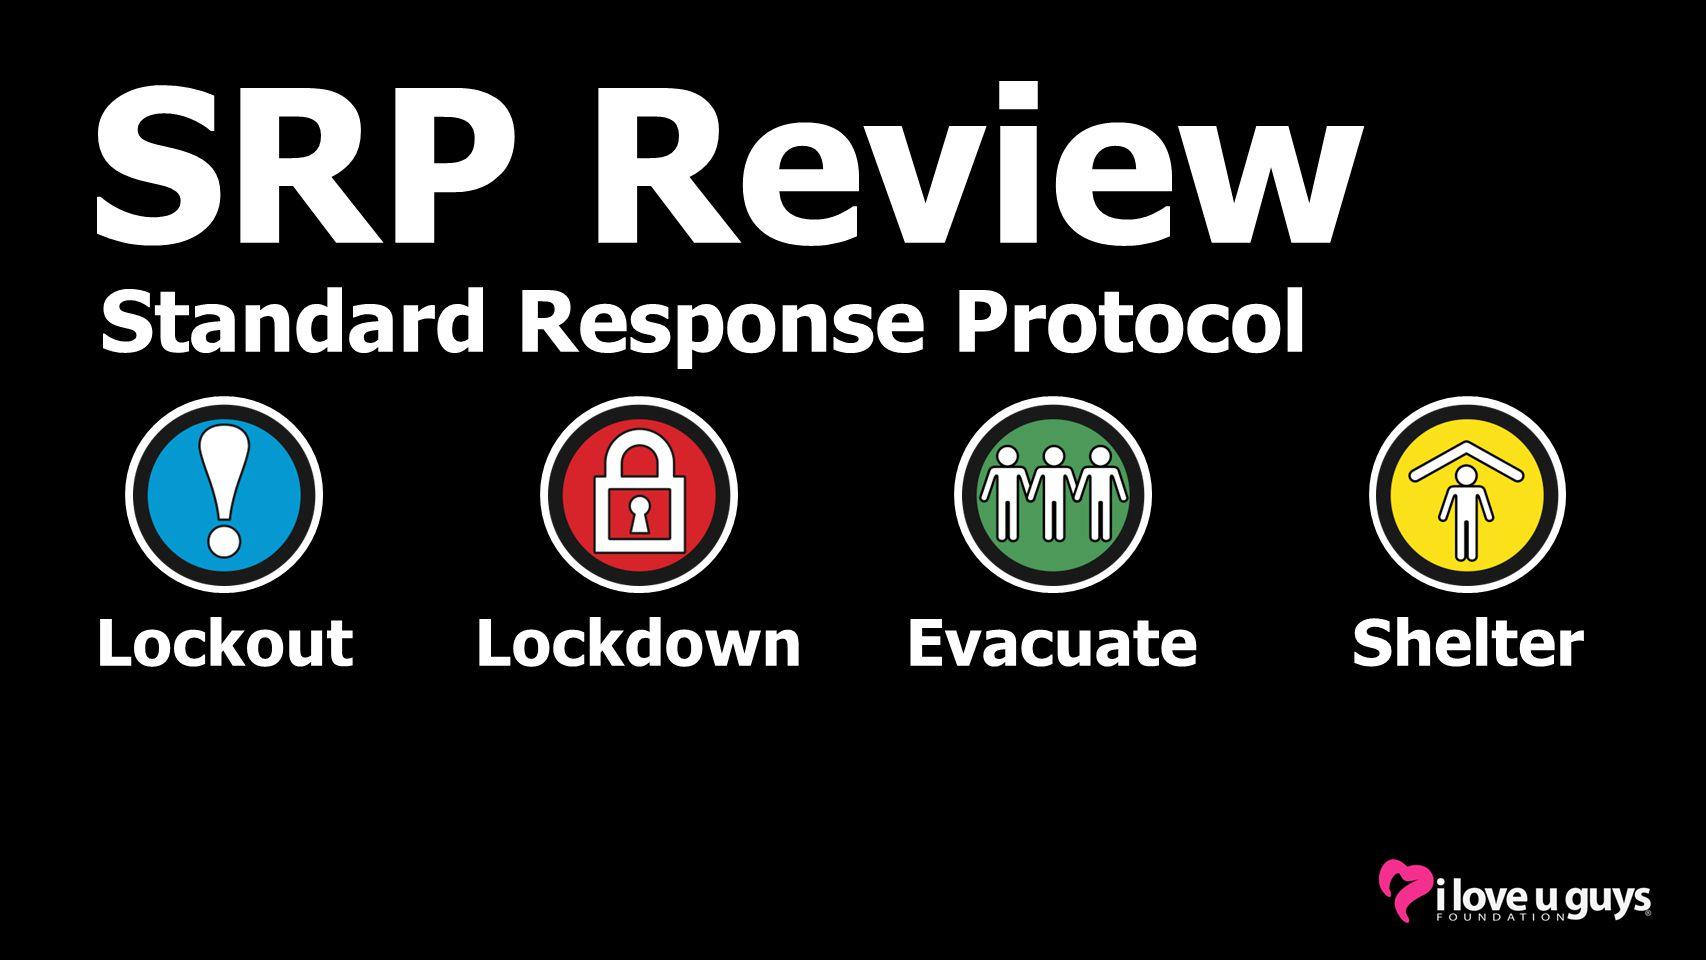 Standard Response Protocol SRP Review LockoutLockdownEvacuateShelter